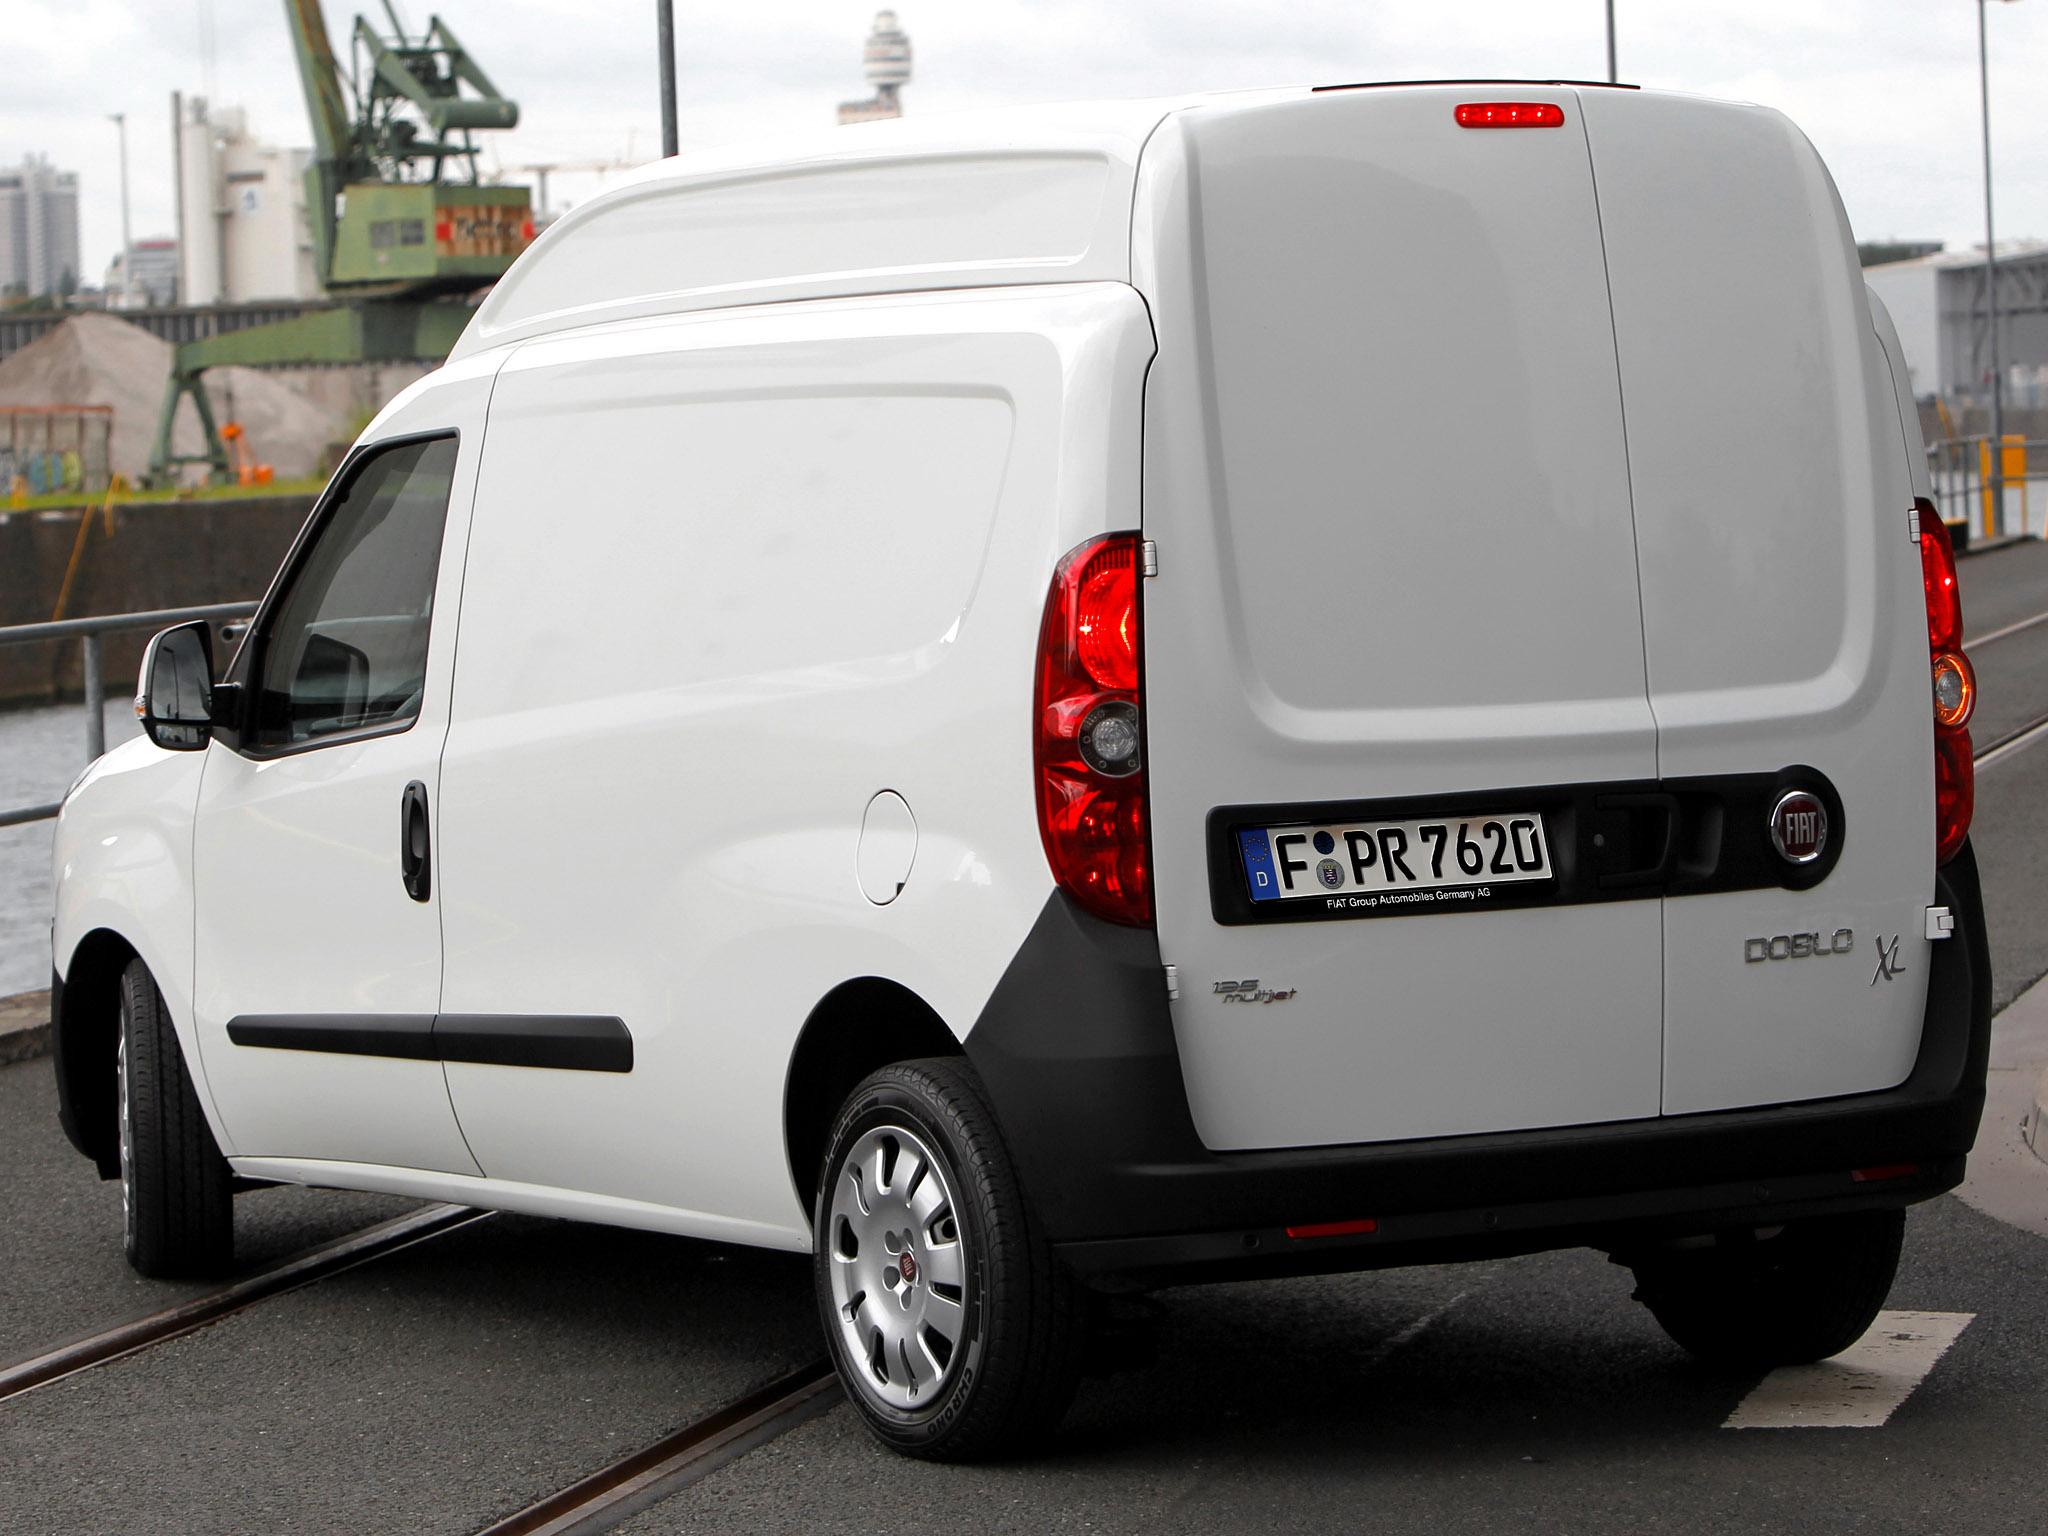 Fiat Doblo Cargo Maxi XL 2012 Fiat Dobl Cargo Maxi XL 2012 Photo 03